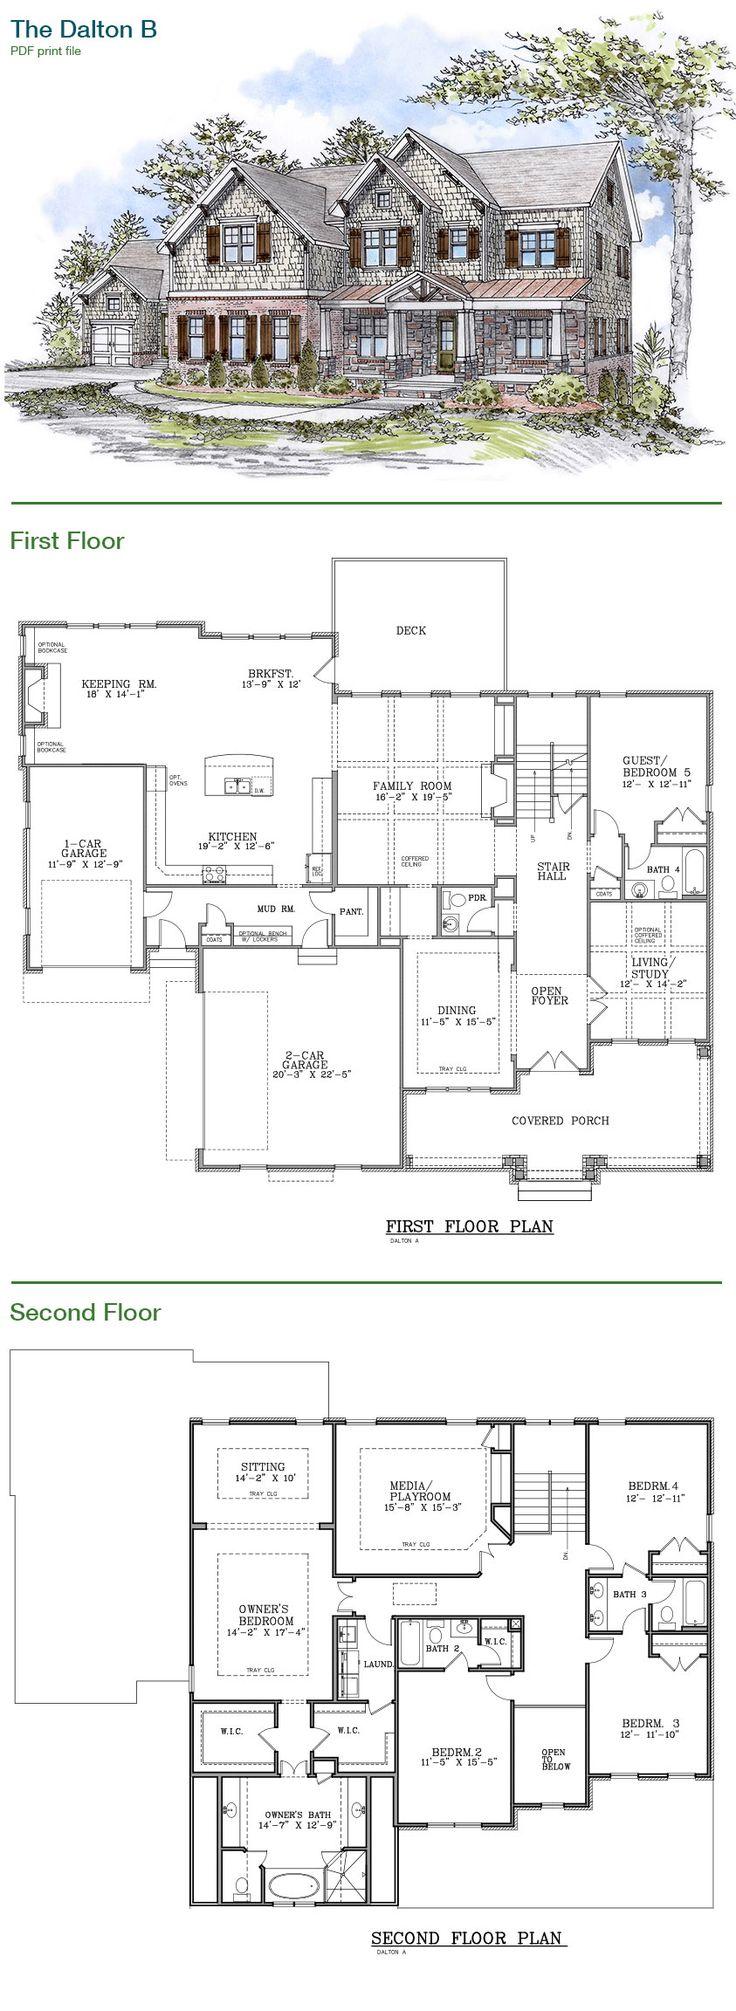 New Construction Homes | New Homes Sandy Springs Georgia | New Homes  Marietta Georgia | Bercher